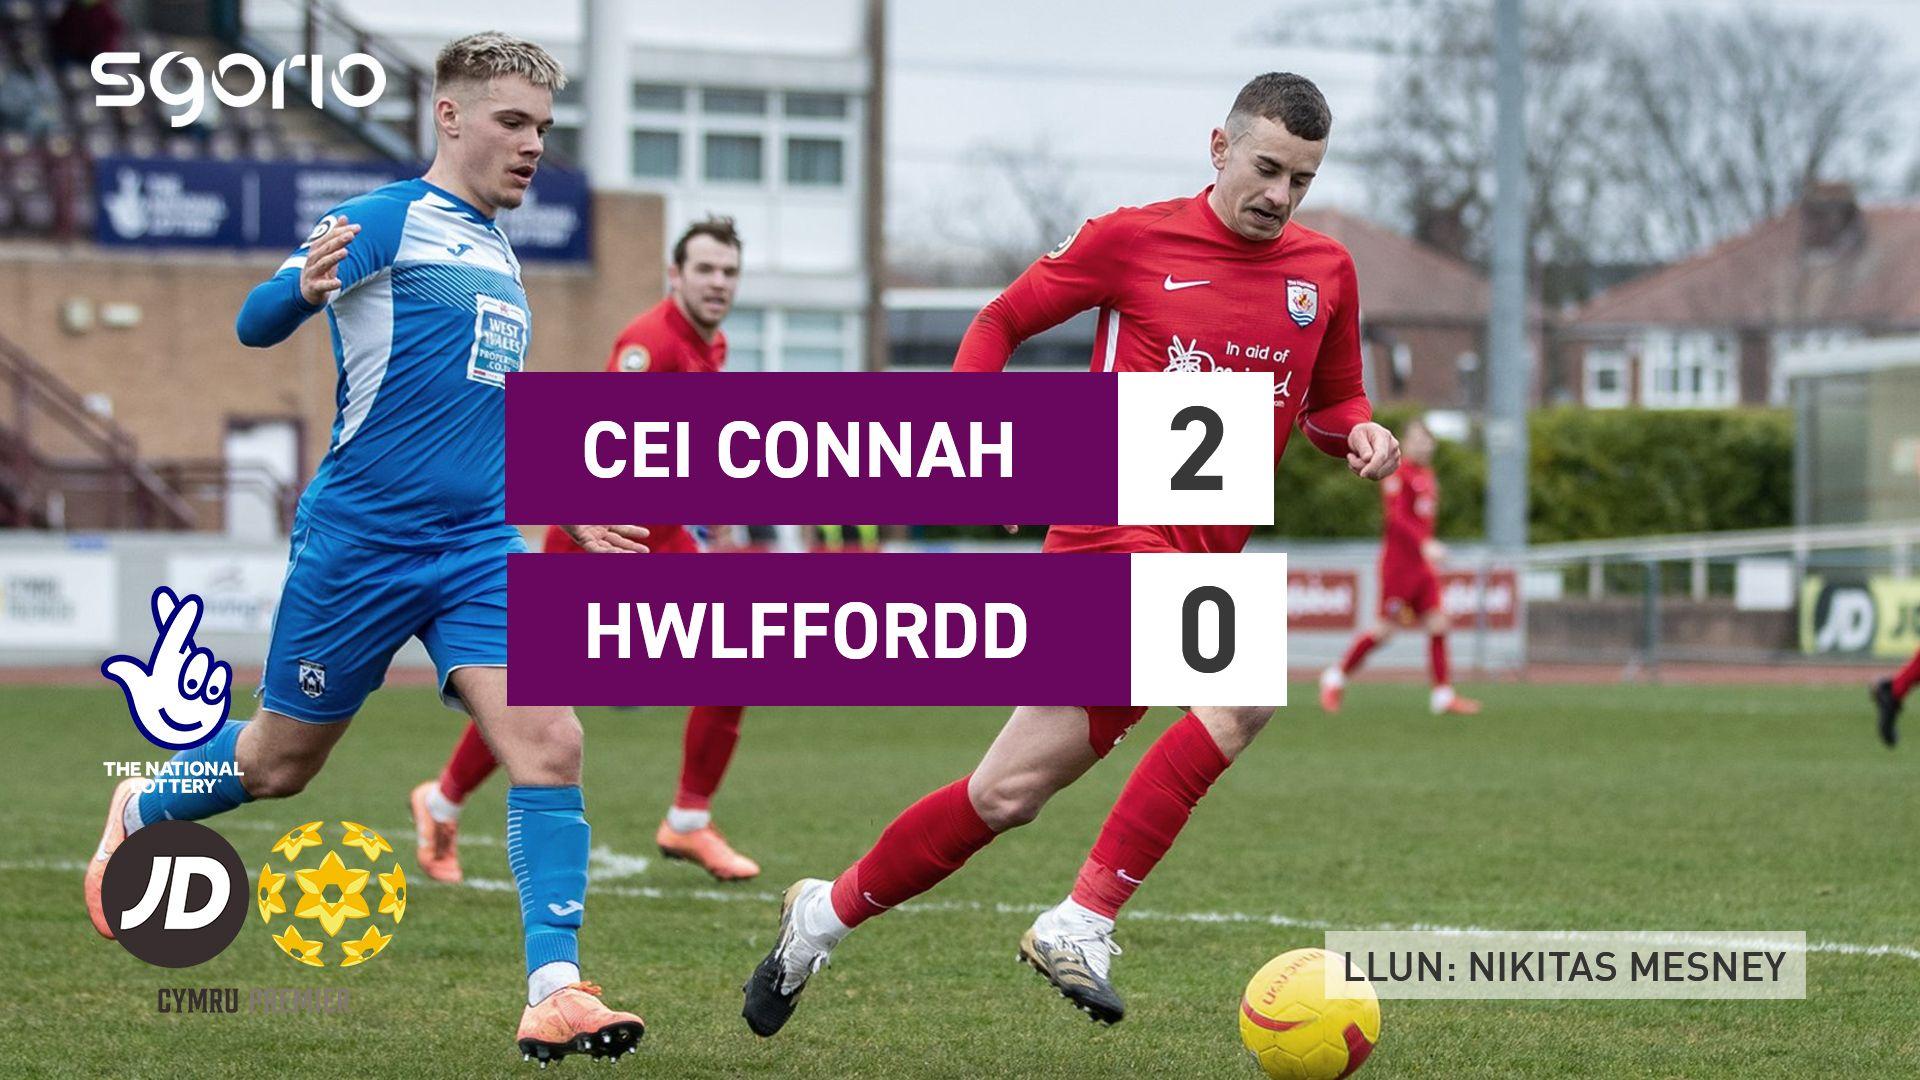 Cei Connah 2-0 Hwlffordd